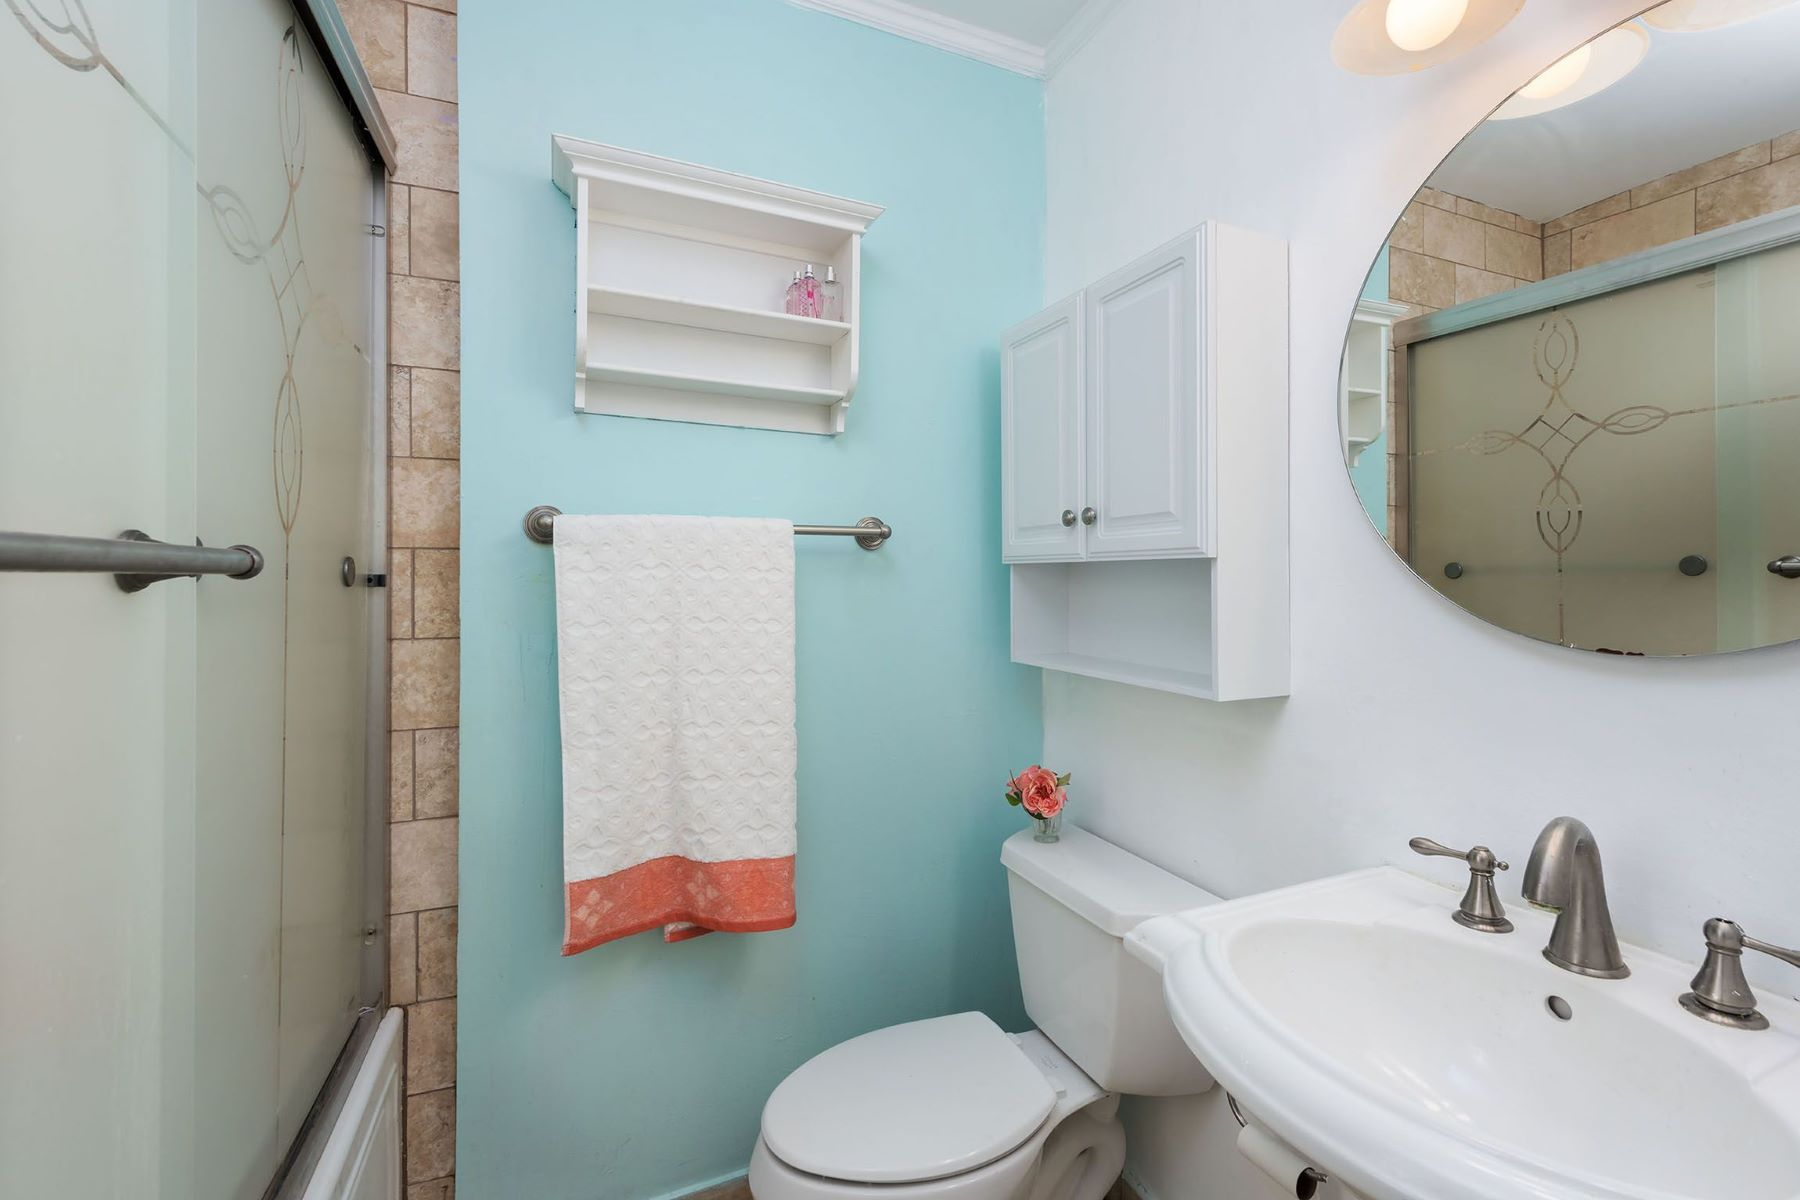 Additional photo for property listing at Lovely Clayton Condo 7571 Buckingham Drive #5 Clayton, Missouri 63105 United States